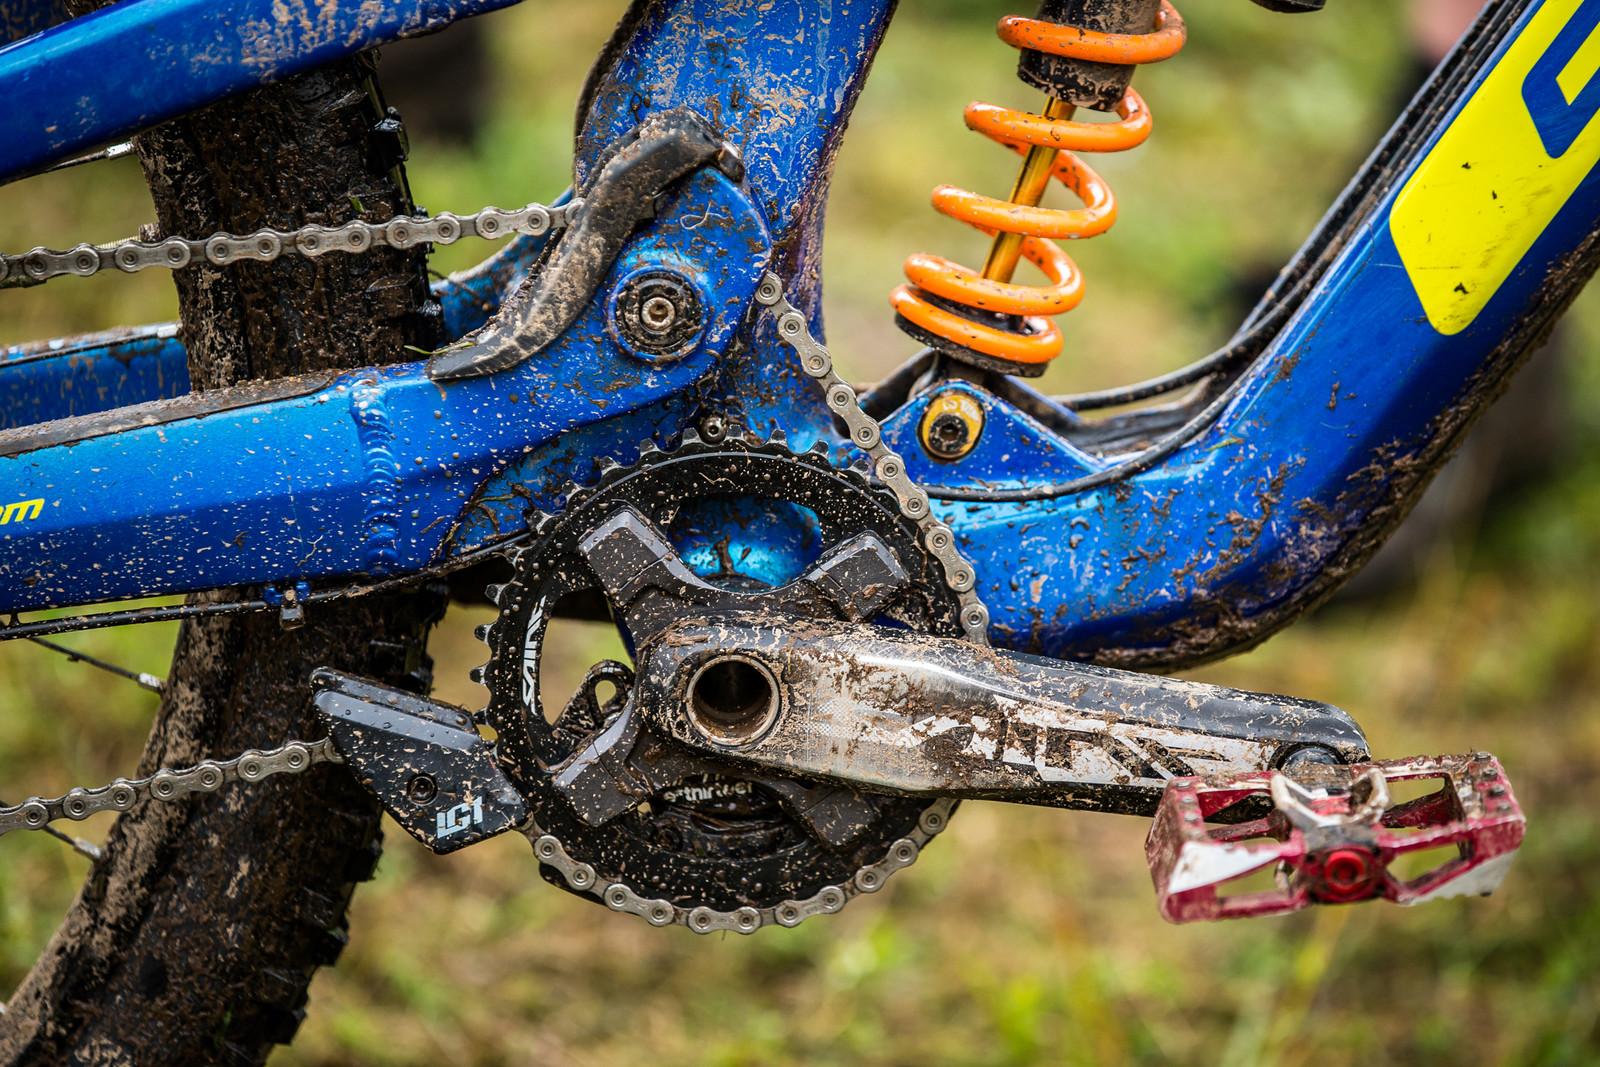 Shimano Saint Cranks - WINNING BIKE - Martin Maes' GT Fury - Mountain Biking Pictures - Vital MTB